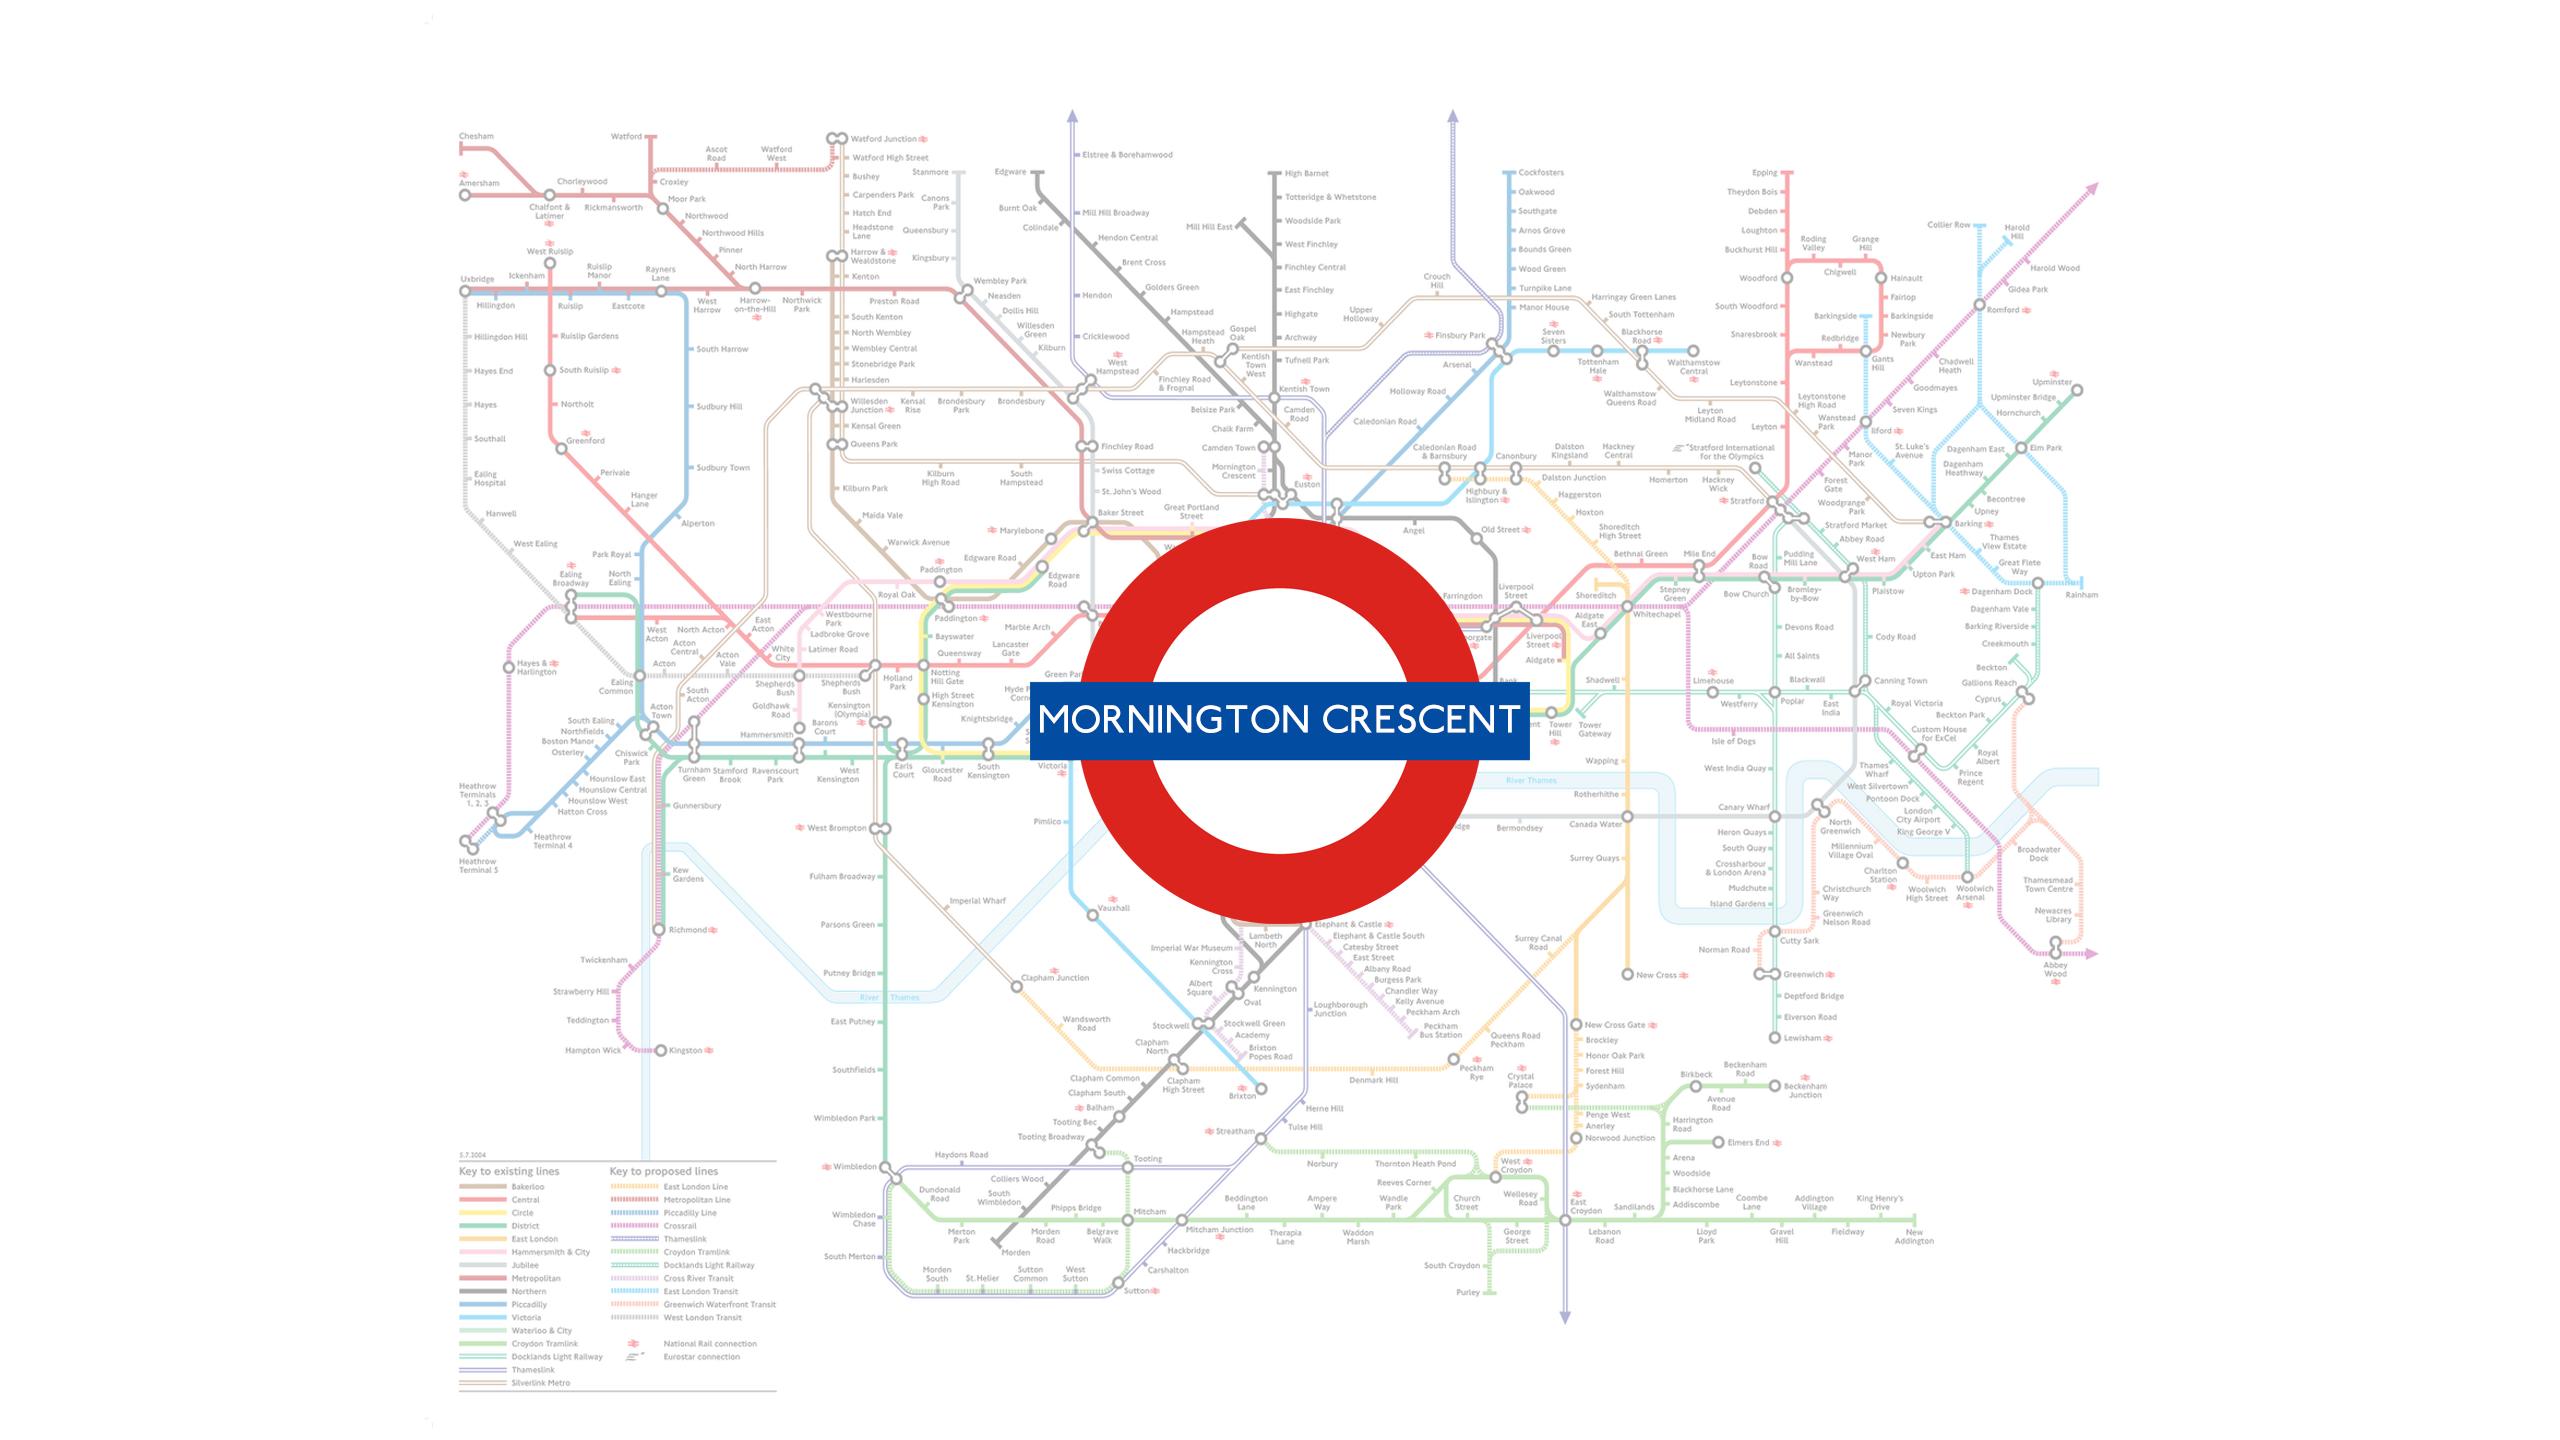 Mornington Crescent (Map)